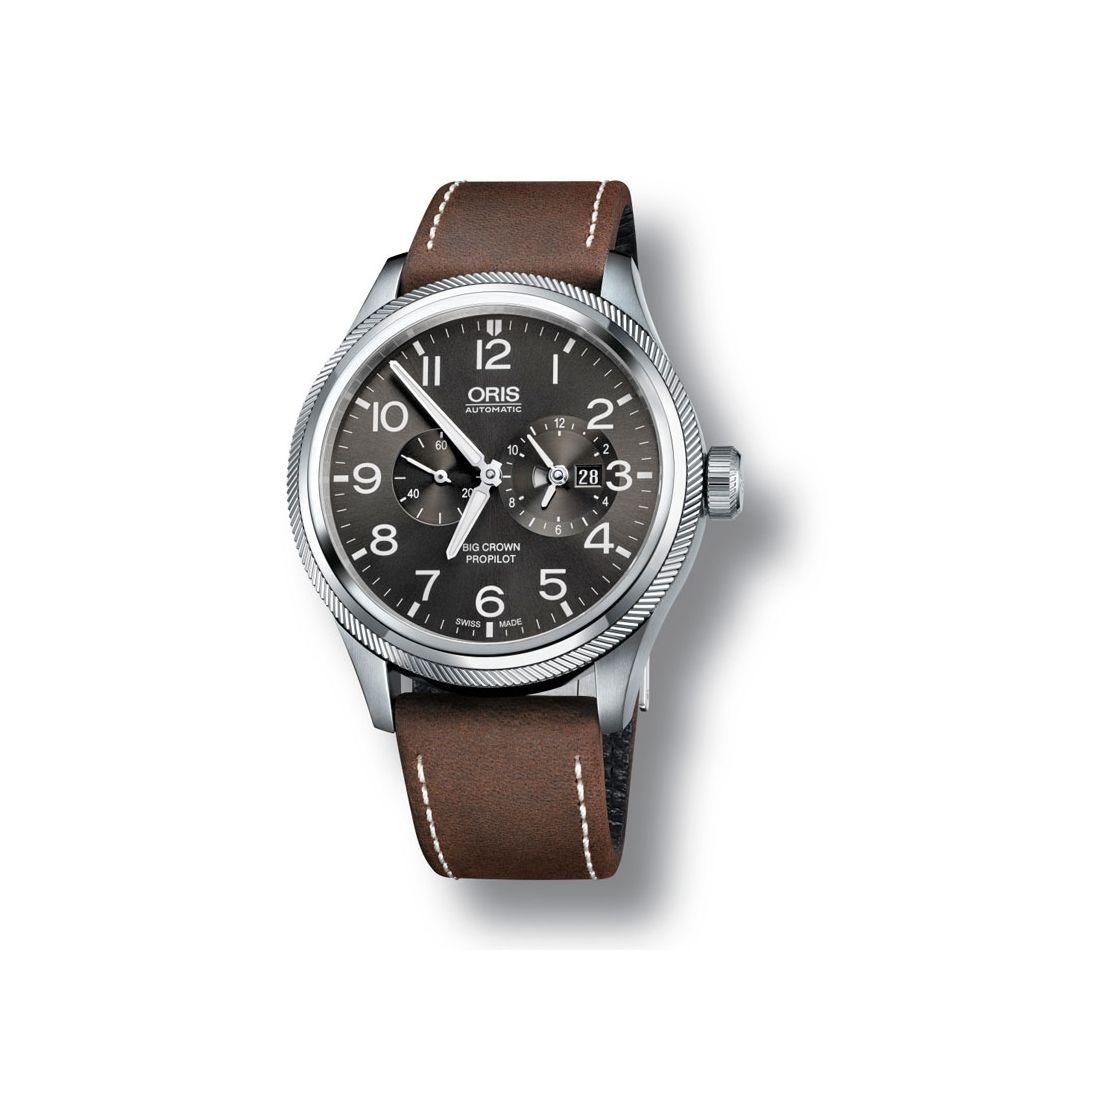 Reloj Oris Big Crown Propilot Worldtimer - 01 690 7735 4063-07 5 22 05  - 1